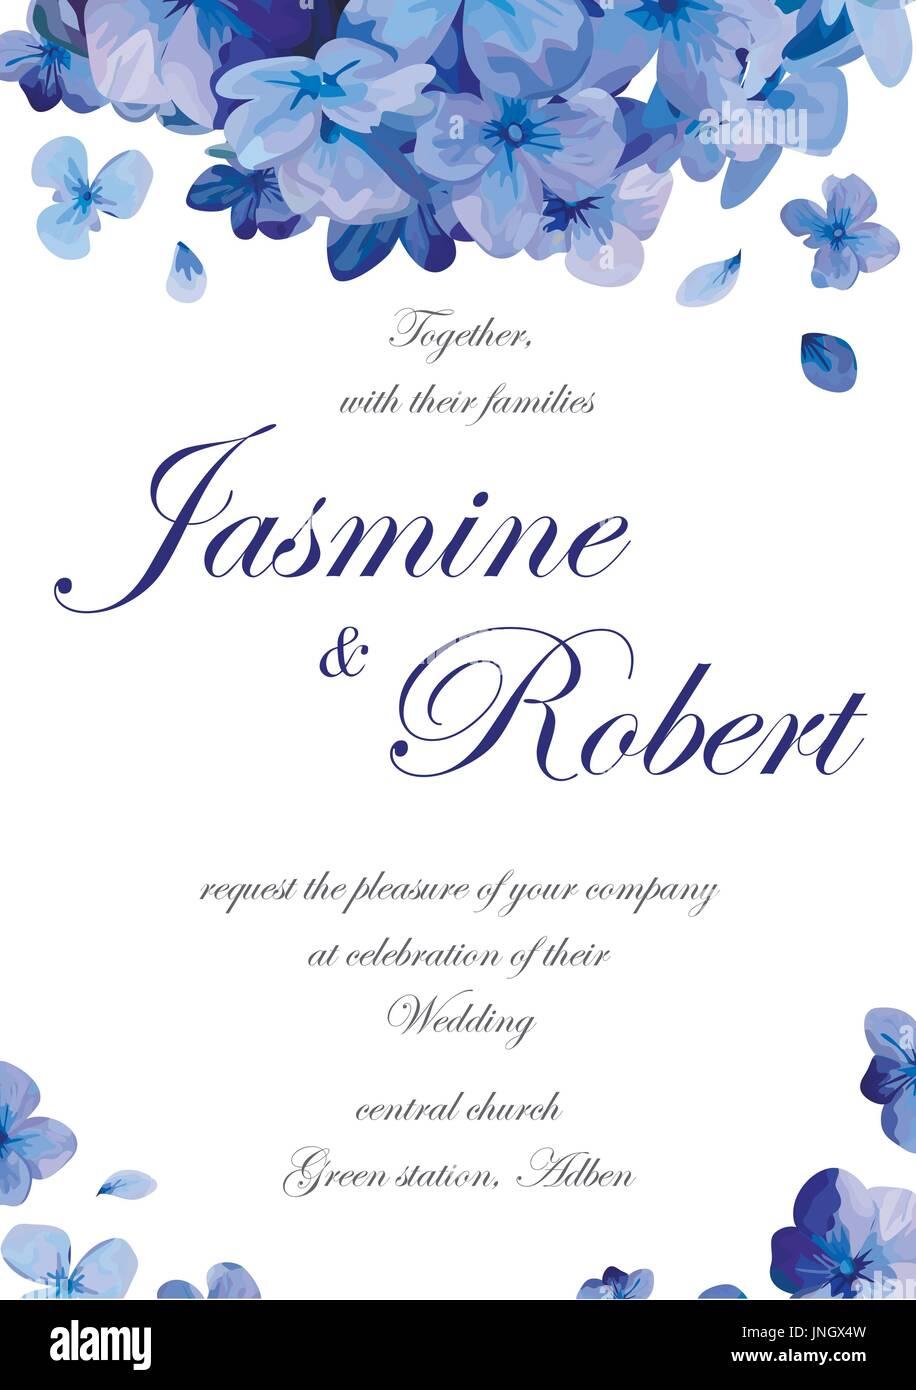 Wedding invitation flower invite card design with blue purple ...